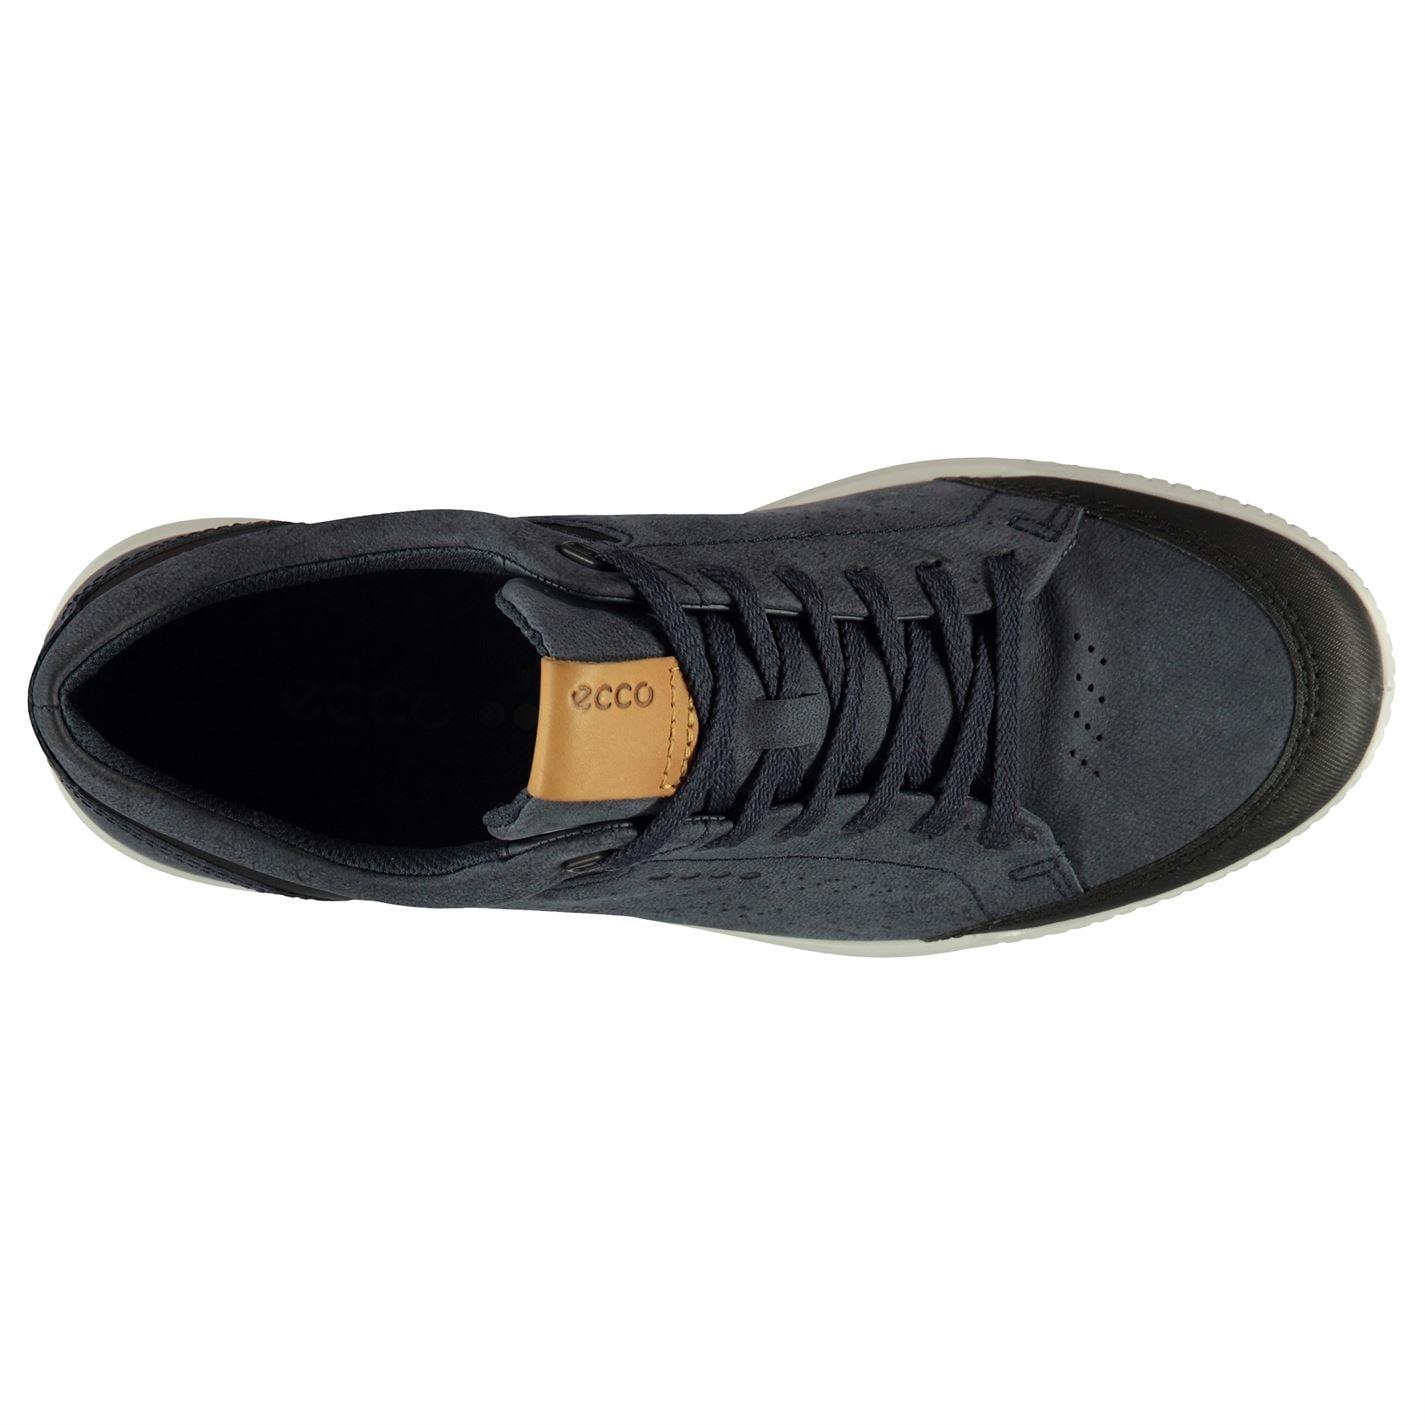 Ecco Street Golf Shoes Ebay